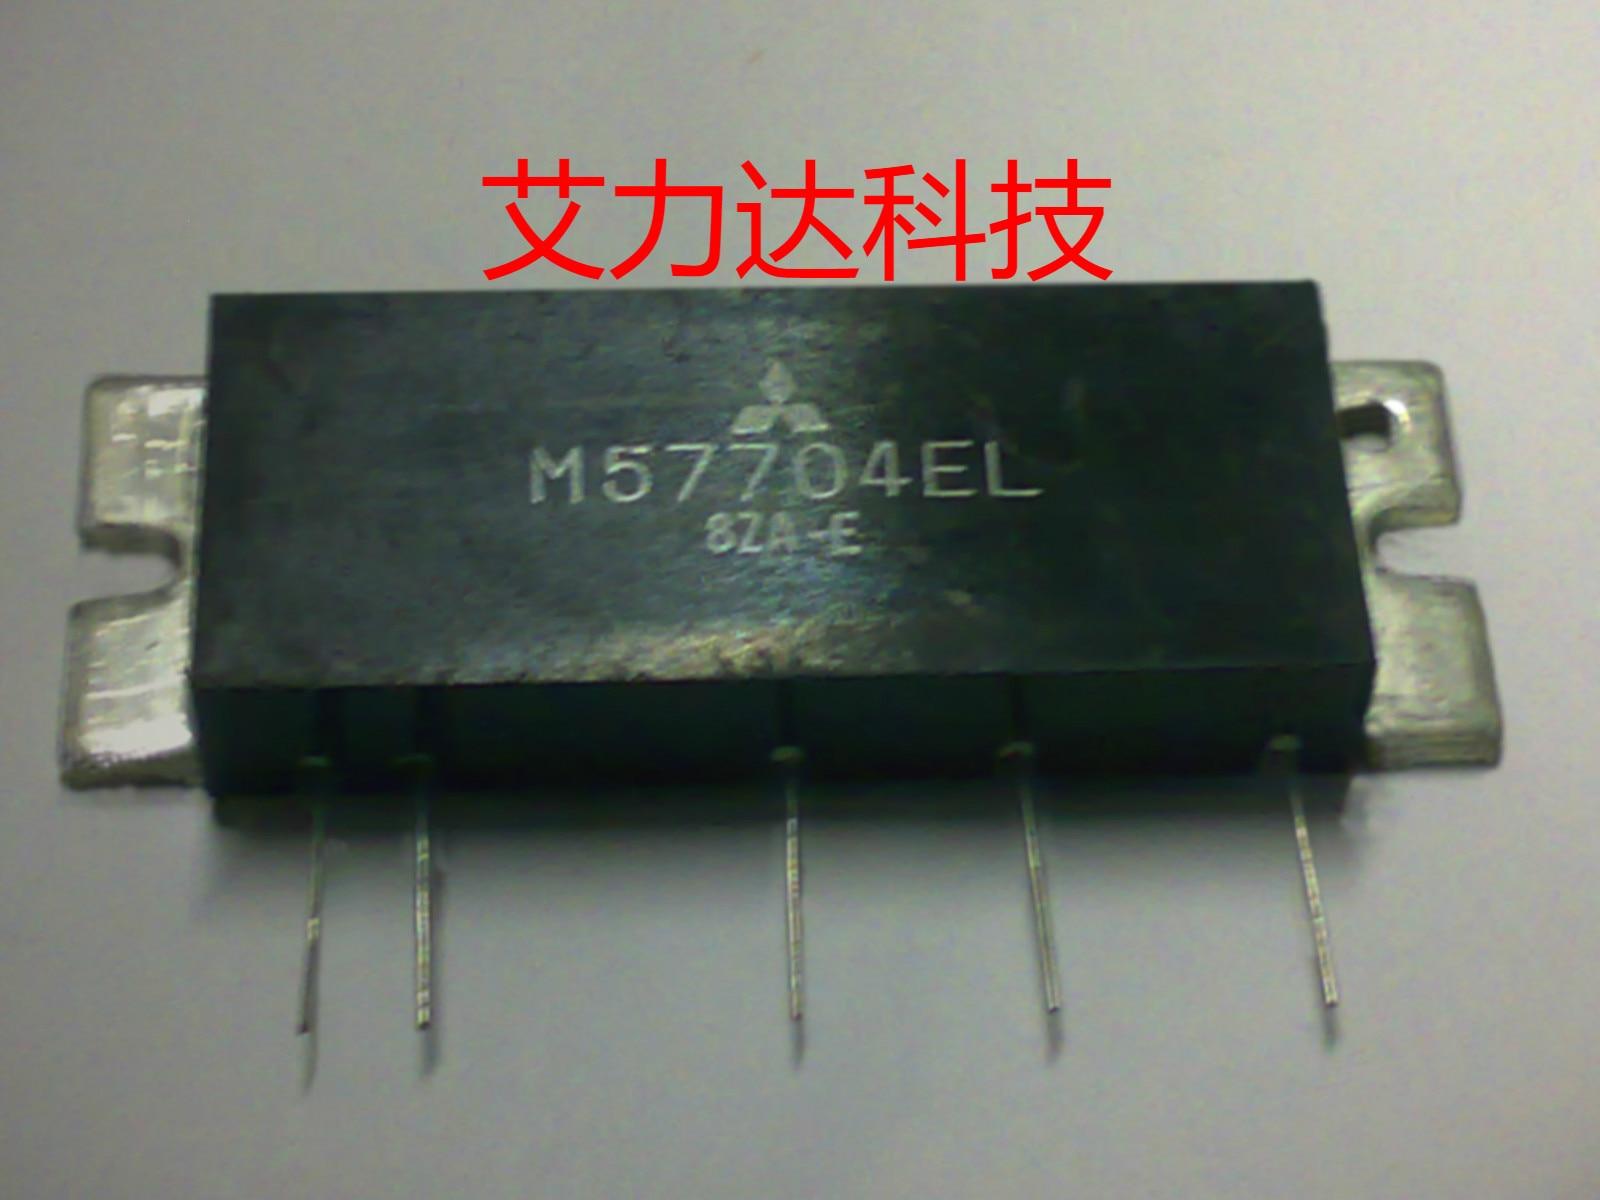 Freeshipping módulo de alta frequência m57704el tubo de alta frequência